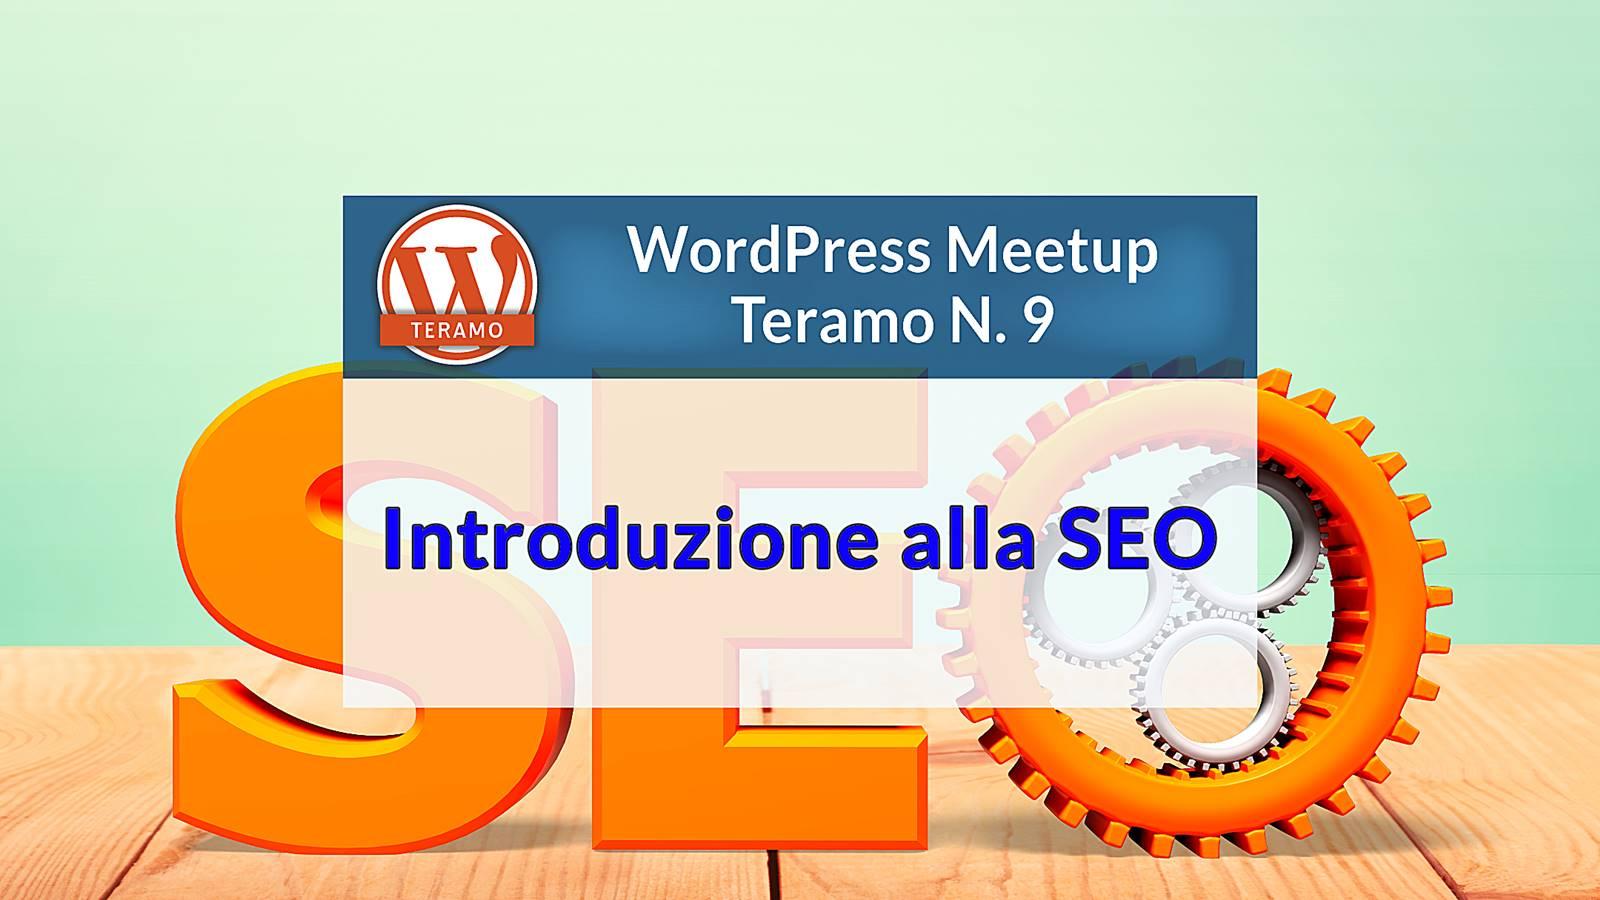 Introduzione alla SEO, Search Engine Optimization, WordPress Meetup Teramo 9, immagine di copertina